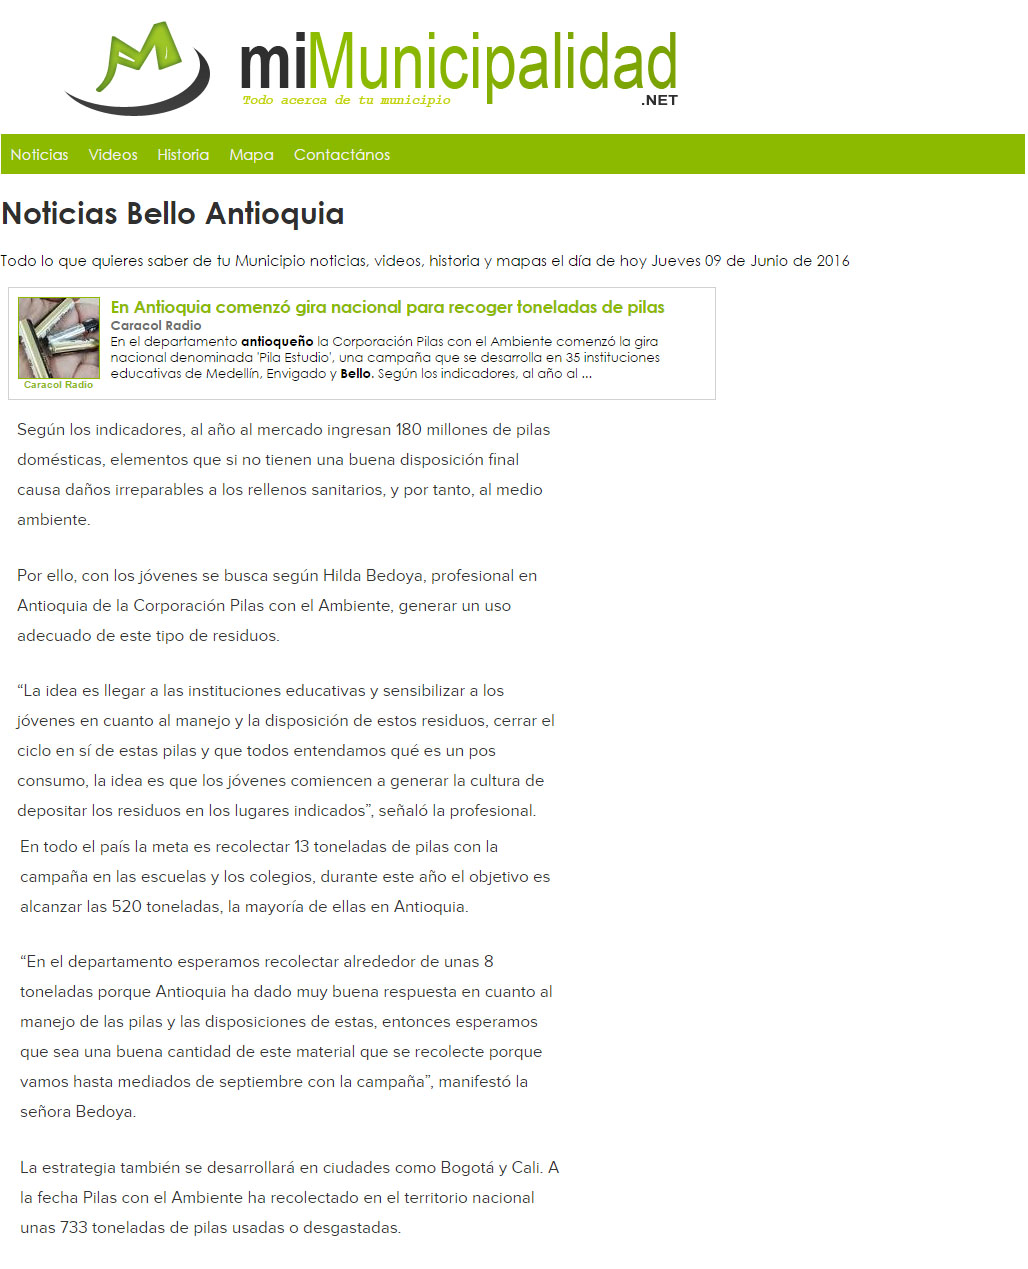 PILA ESTUDIO-Nota www.mimunicipalidad.net – 09-06-2016